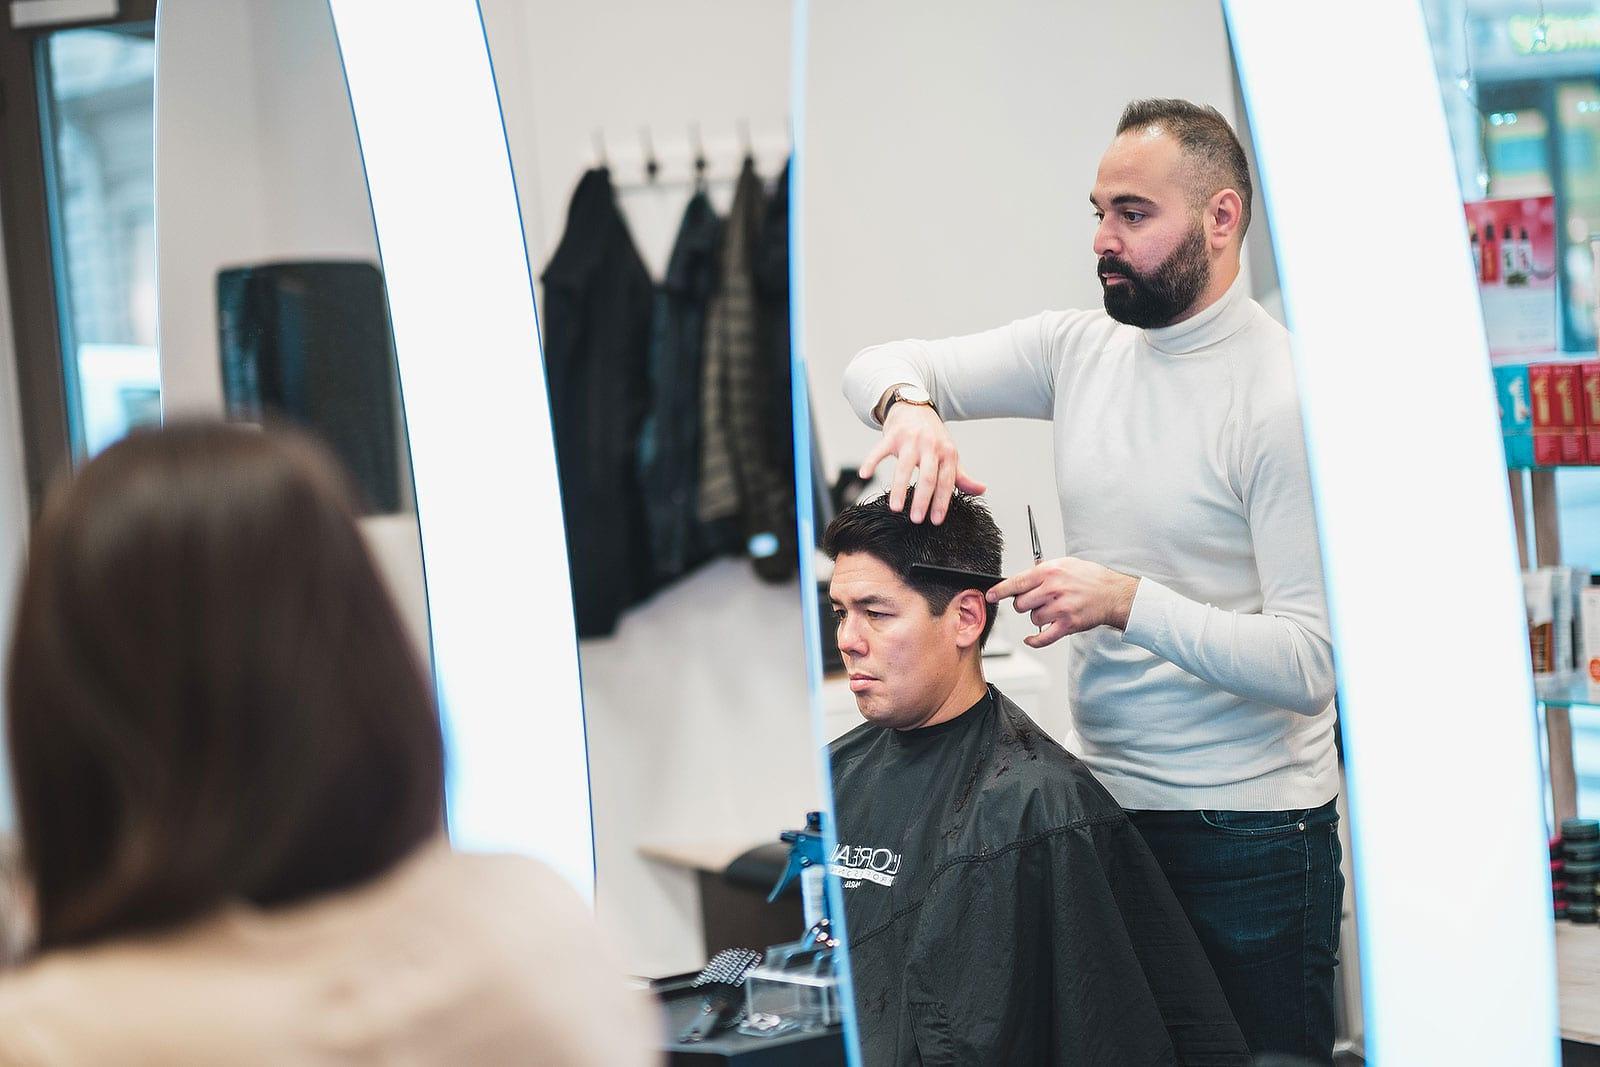 fadi frisör uppsala